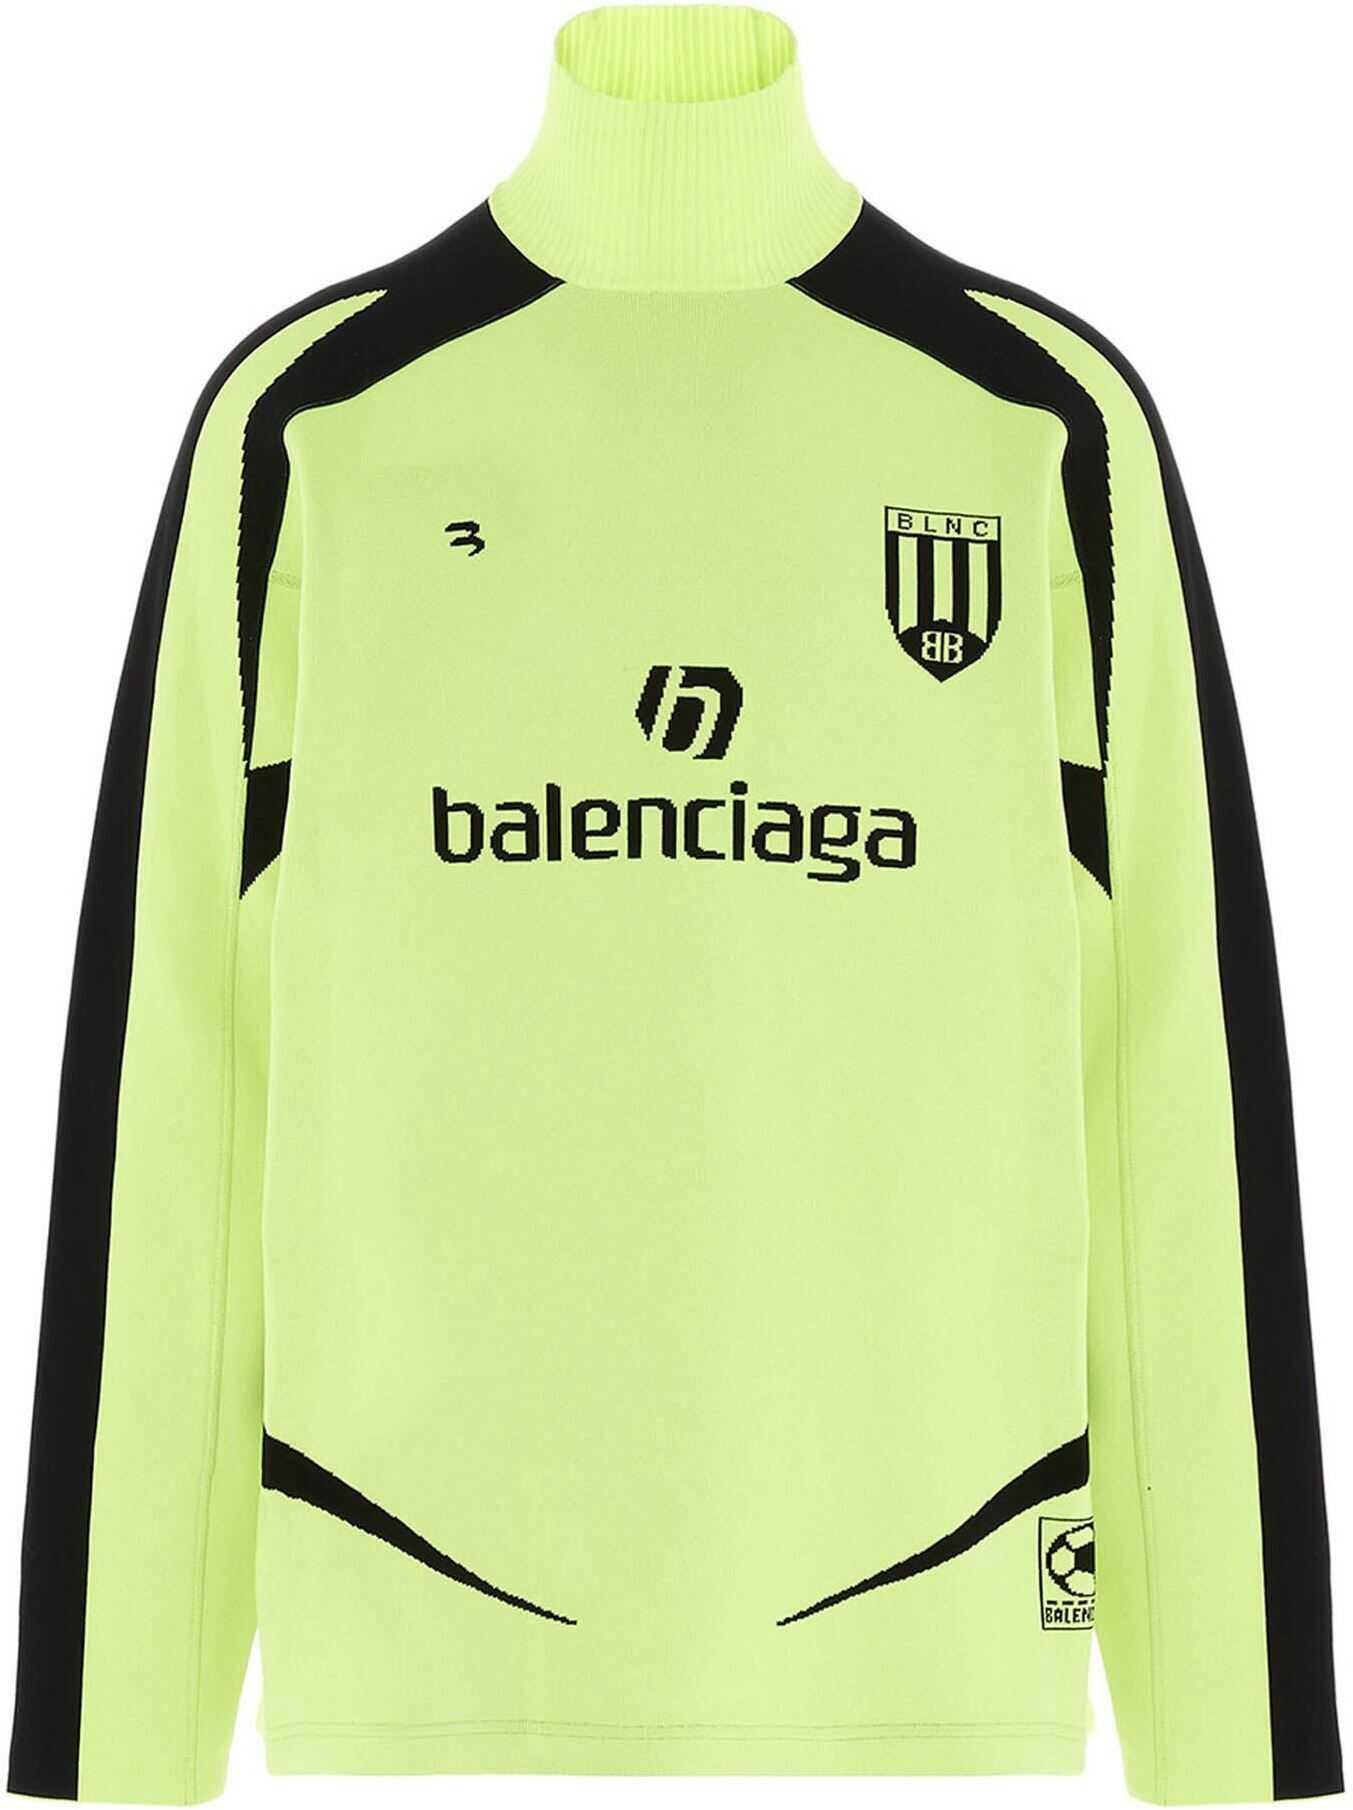 Balenciaga Soccer Turtleneck In Lime Yellow Yellow imagine